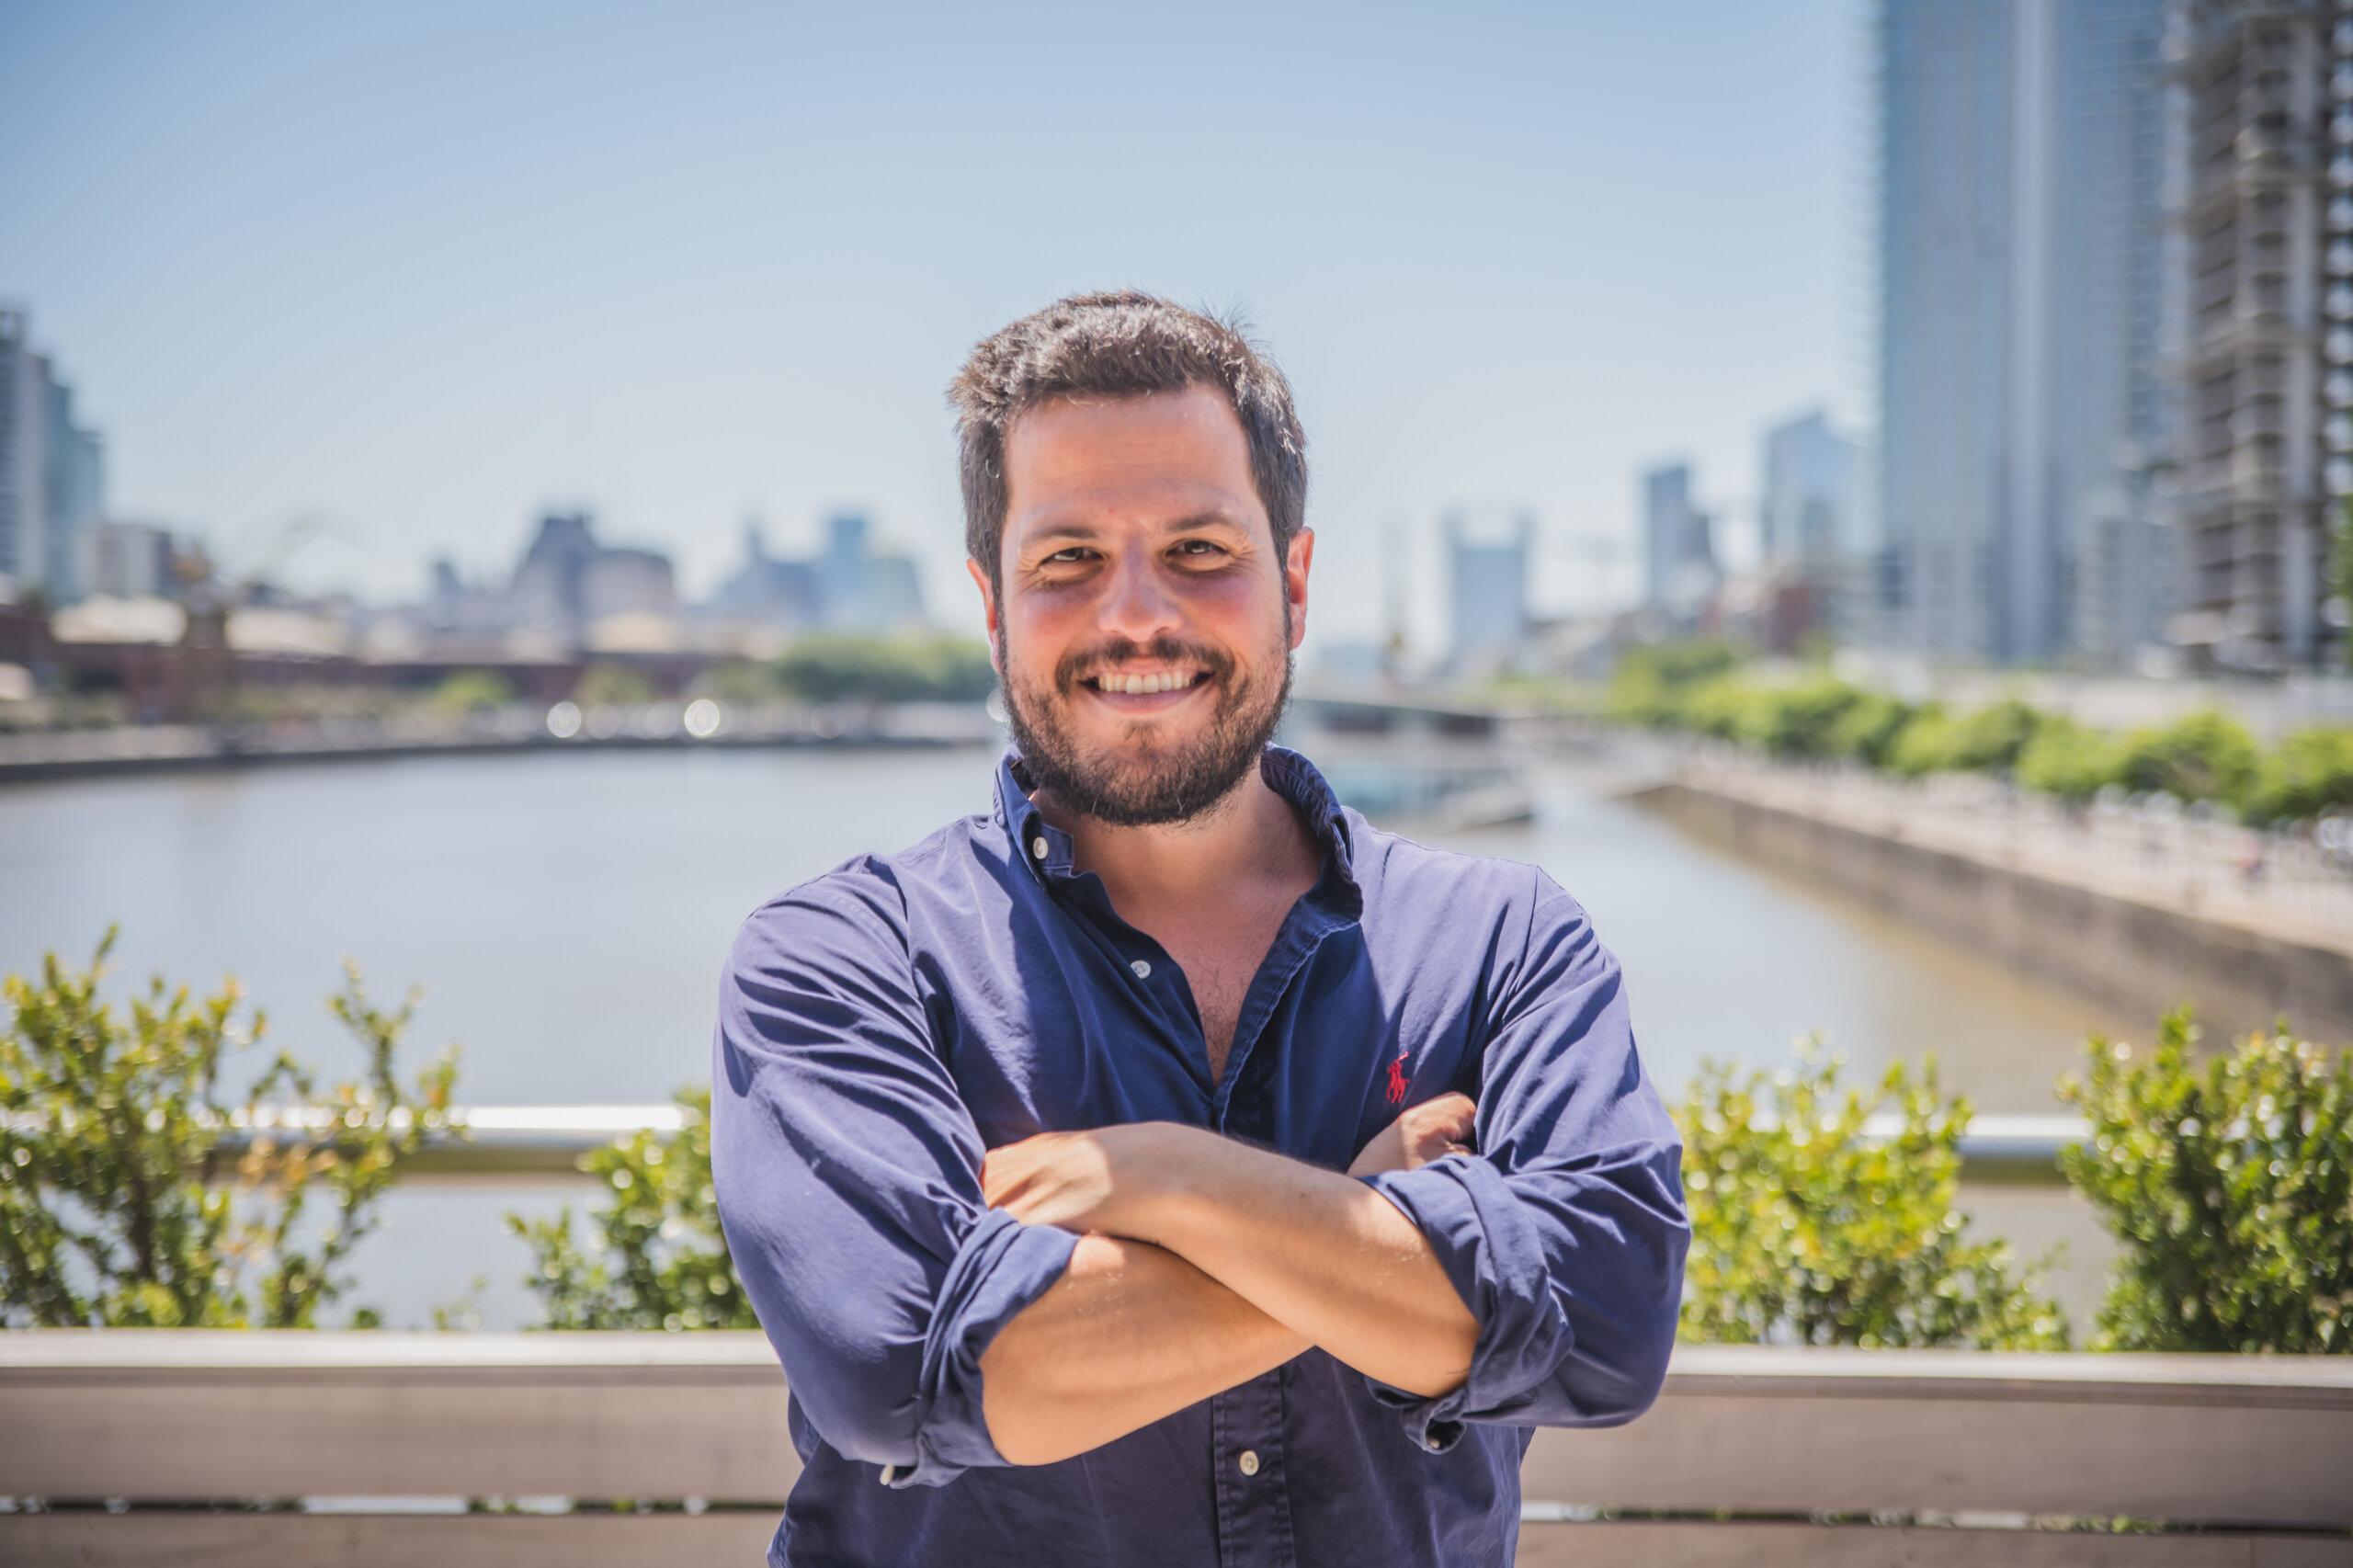 VU designa a Gastón Gené como COO & Director de Estrategia Corporativa